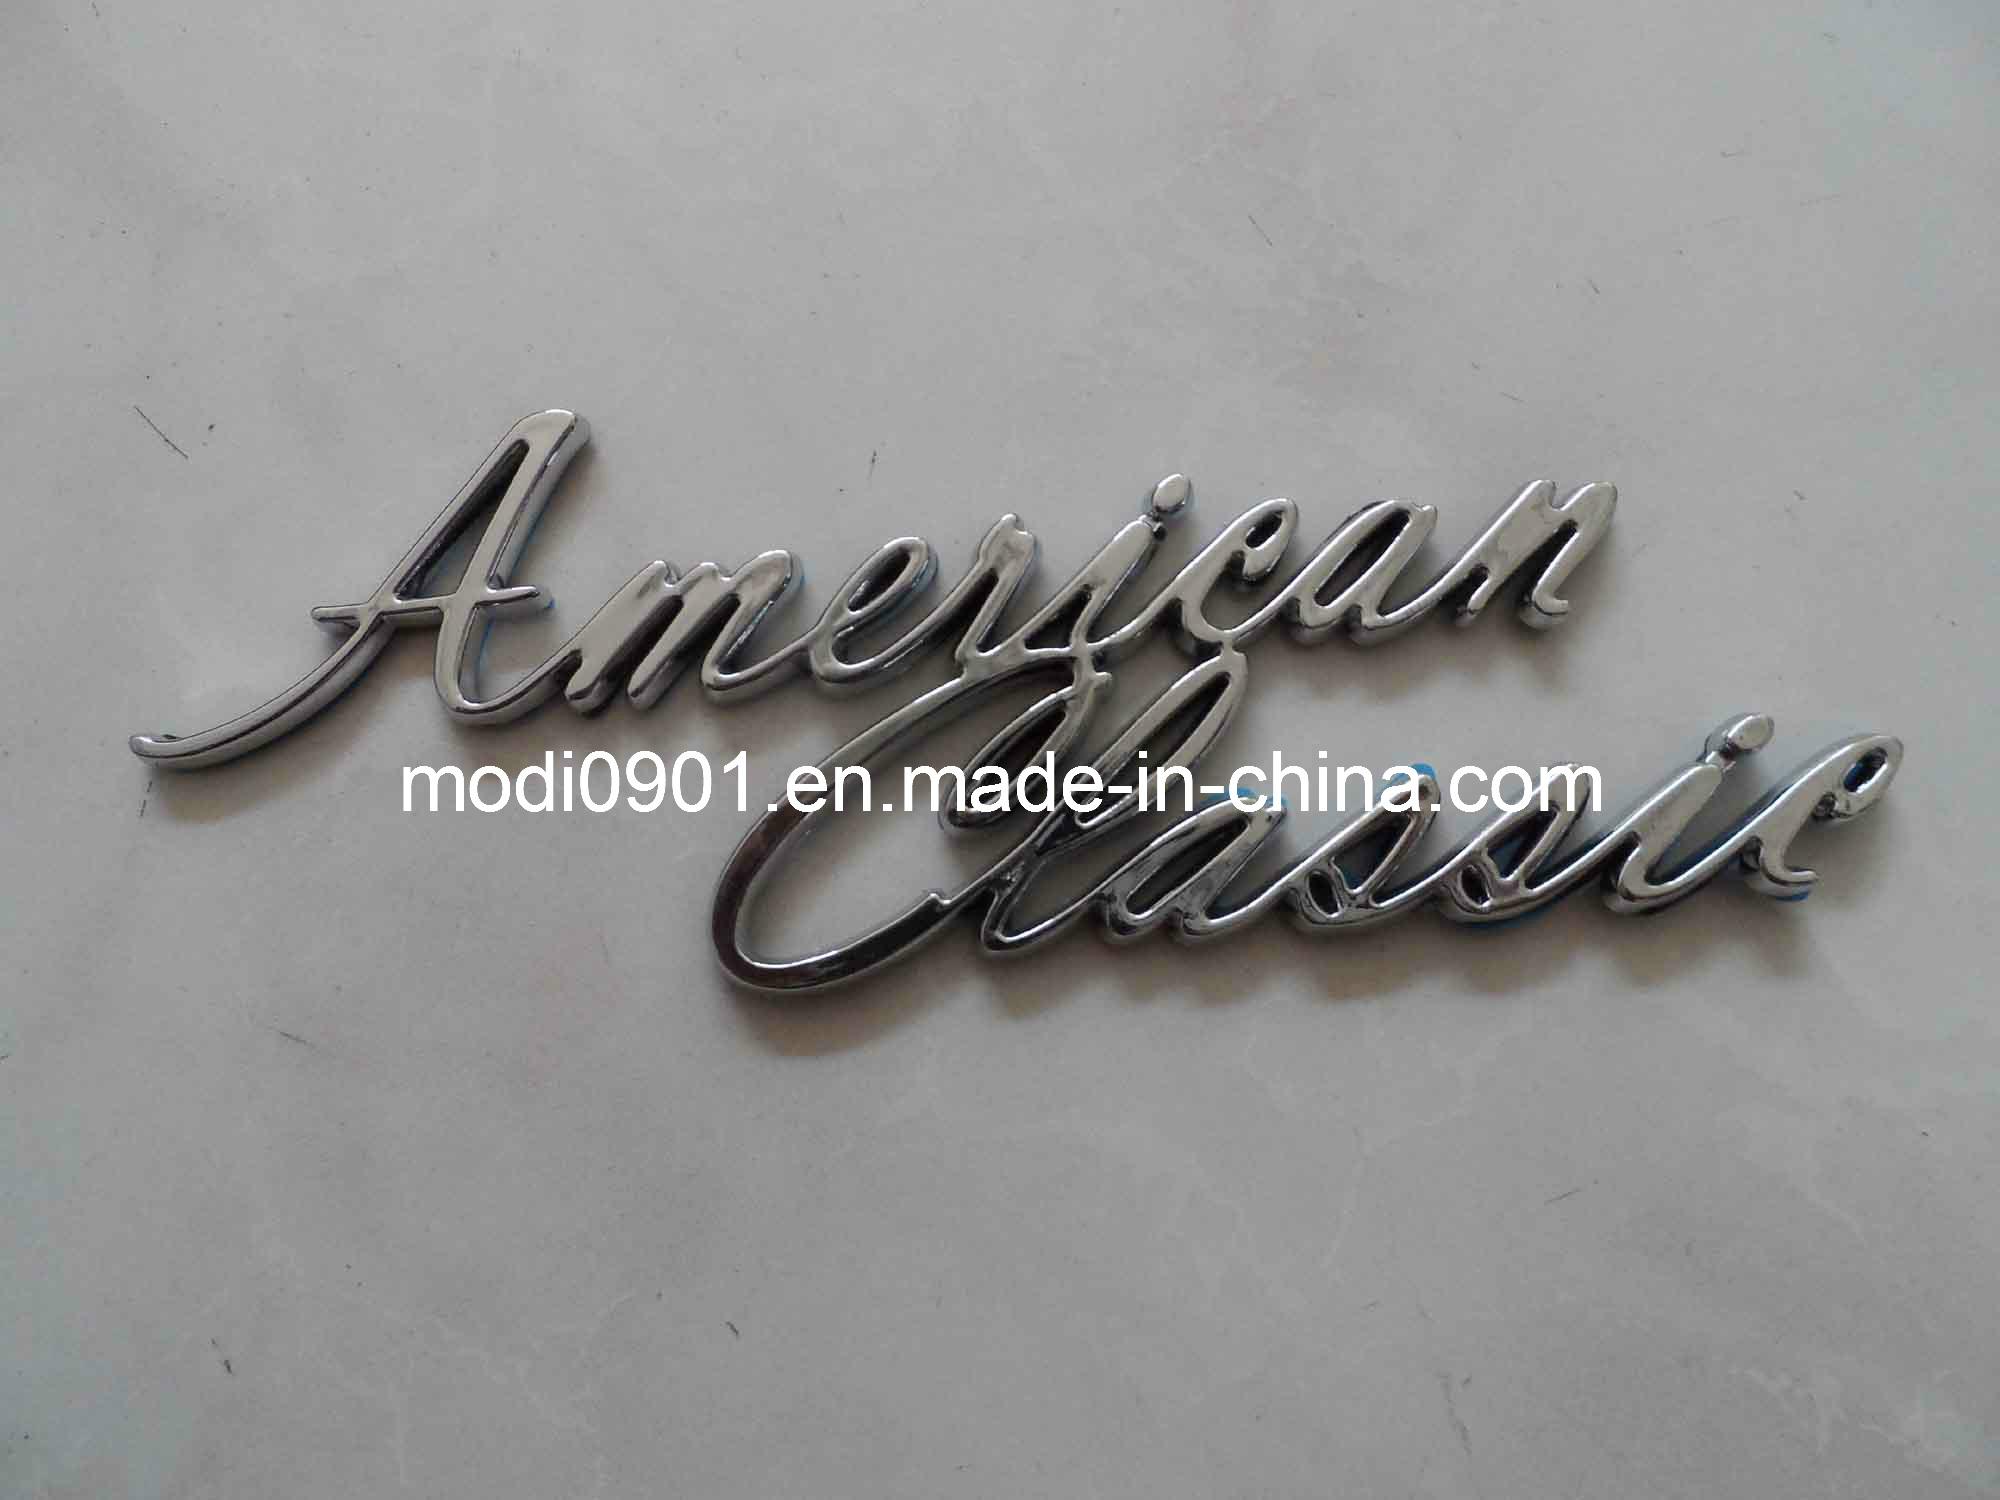 China Custom Abs Car Badges And Chrome Auto Emblems Customized